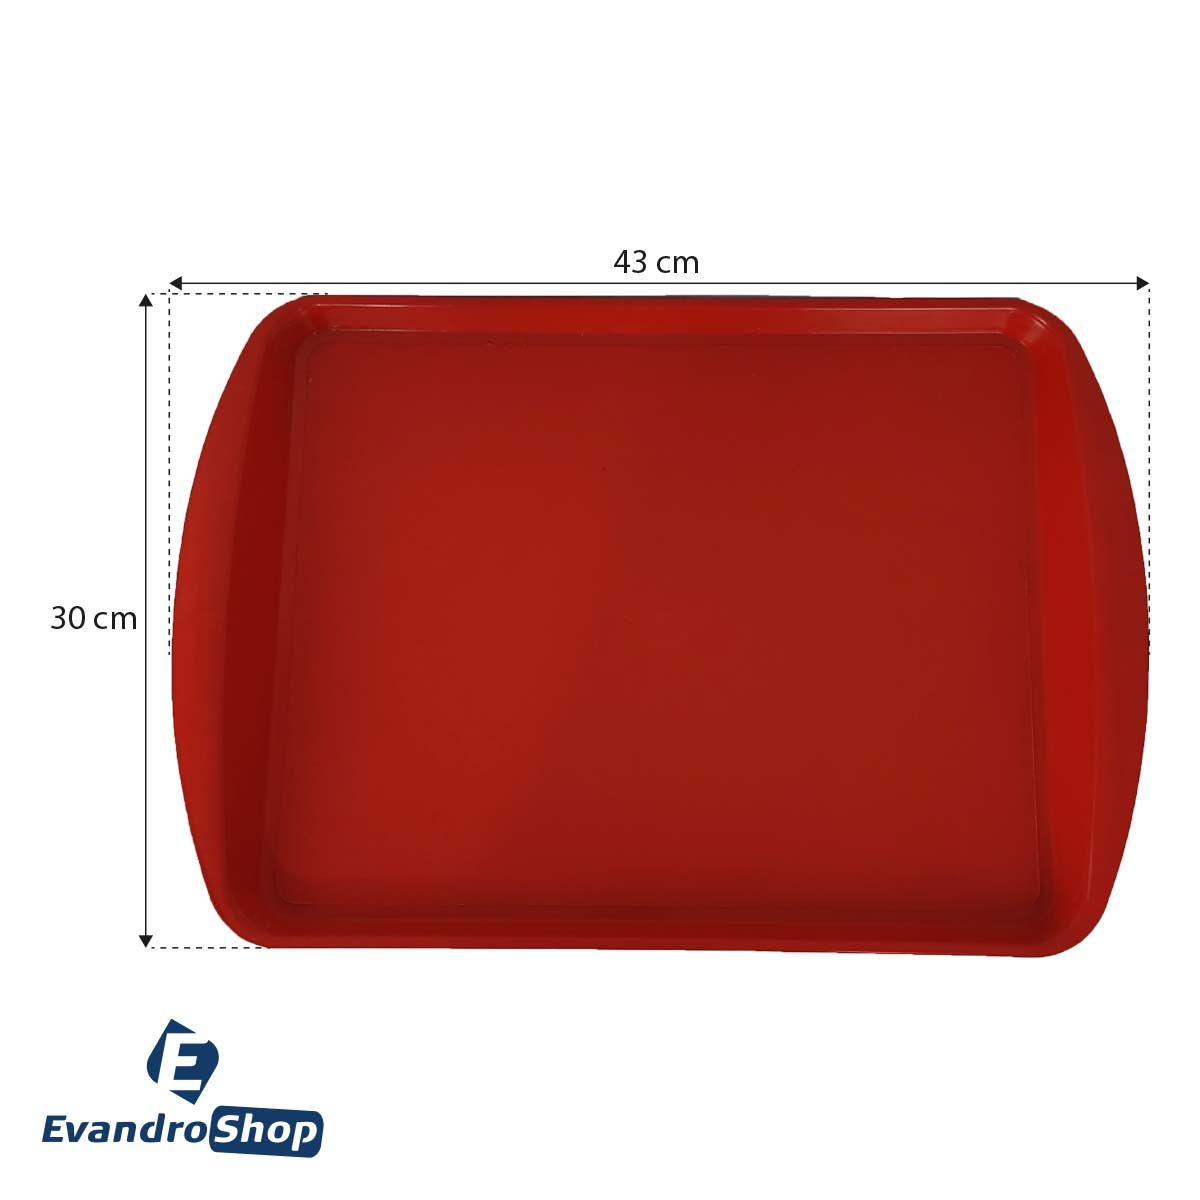 Bandeja Plástica Vermelha S-300 - Supercron